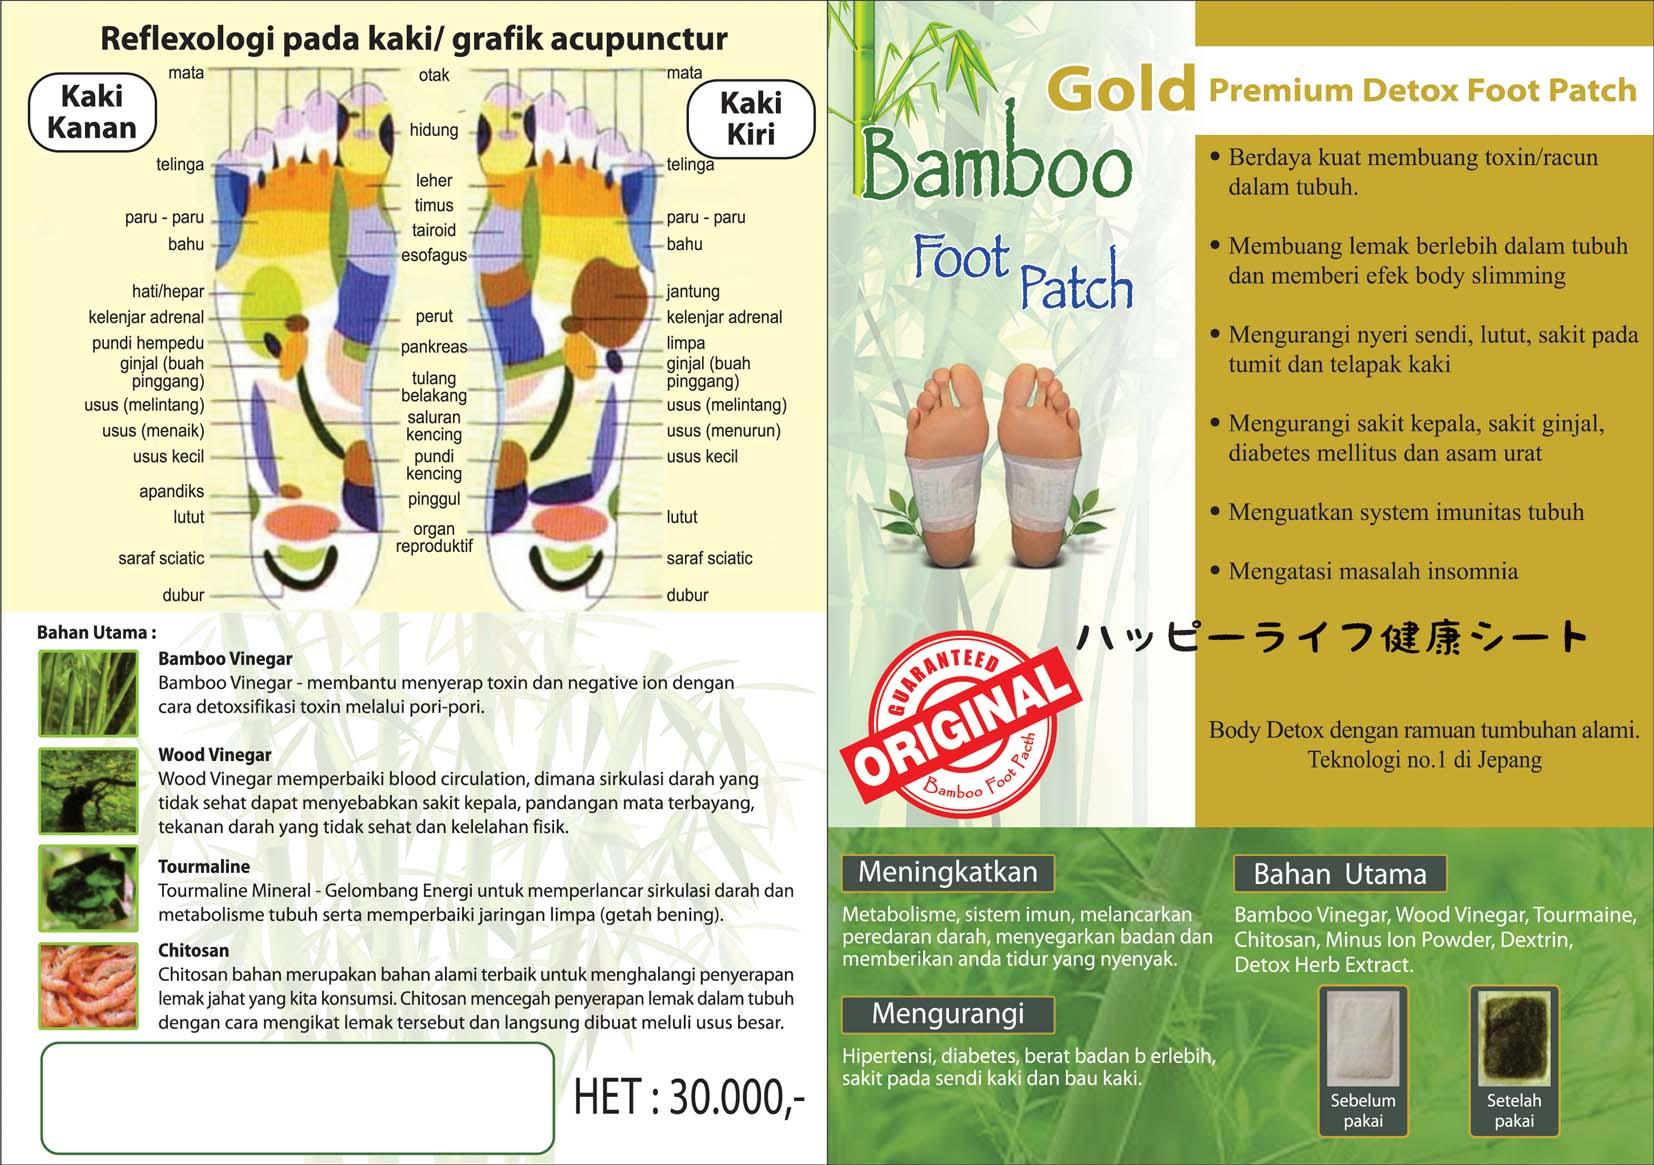 Jual Koyo Bamboo Gold Original - Premium Detox Foot Patch - Toko Olid H&T | Tokopedia